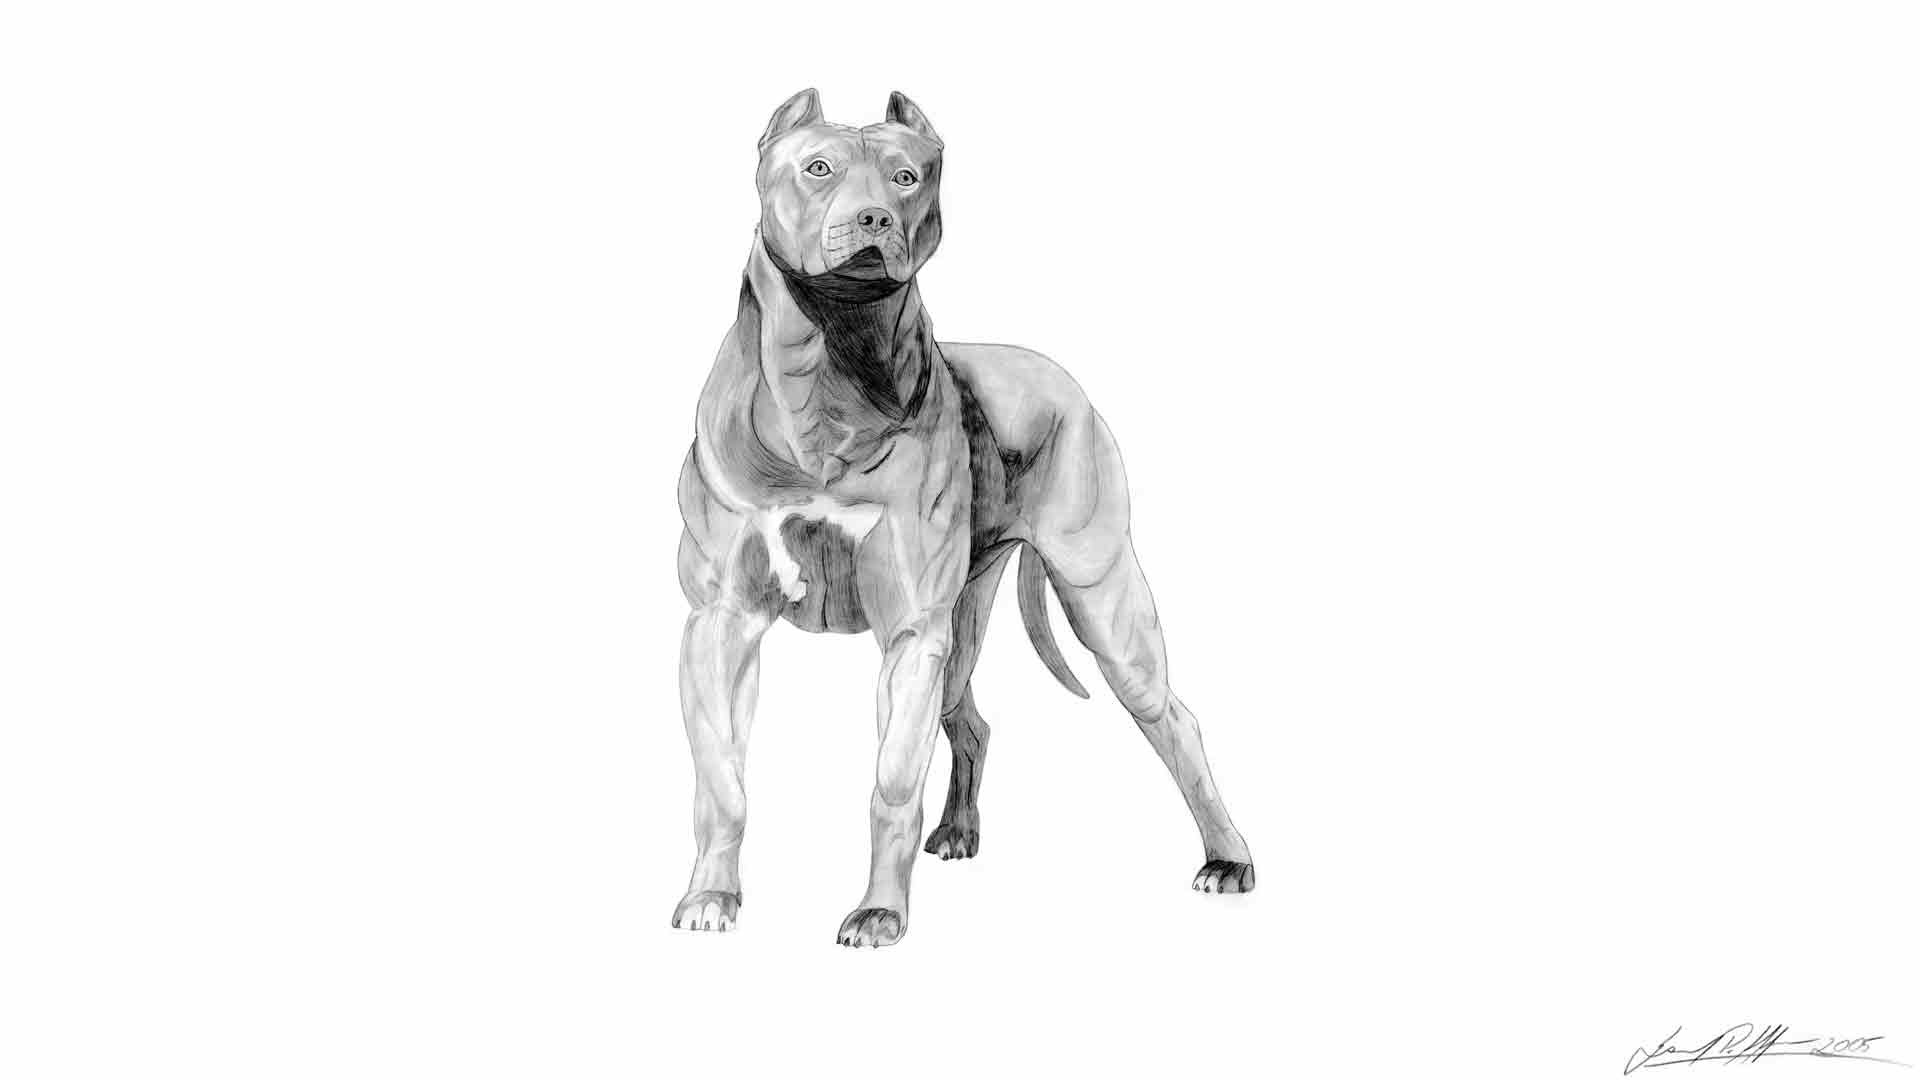 51 Pit Bull Dogs Free Pitbull Full Hd Wallpaper with .